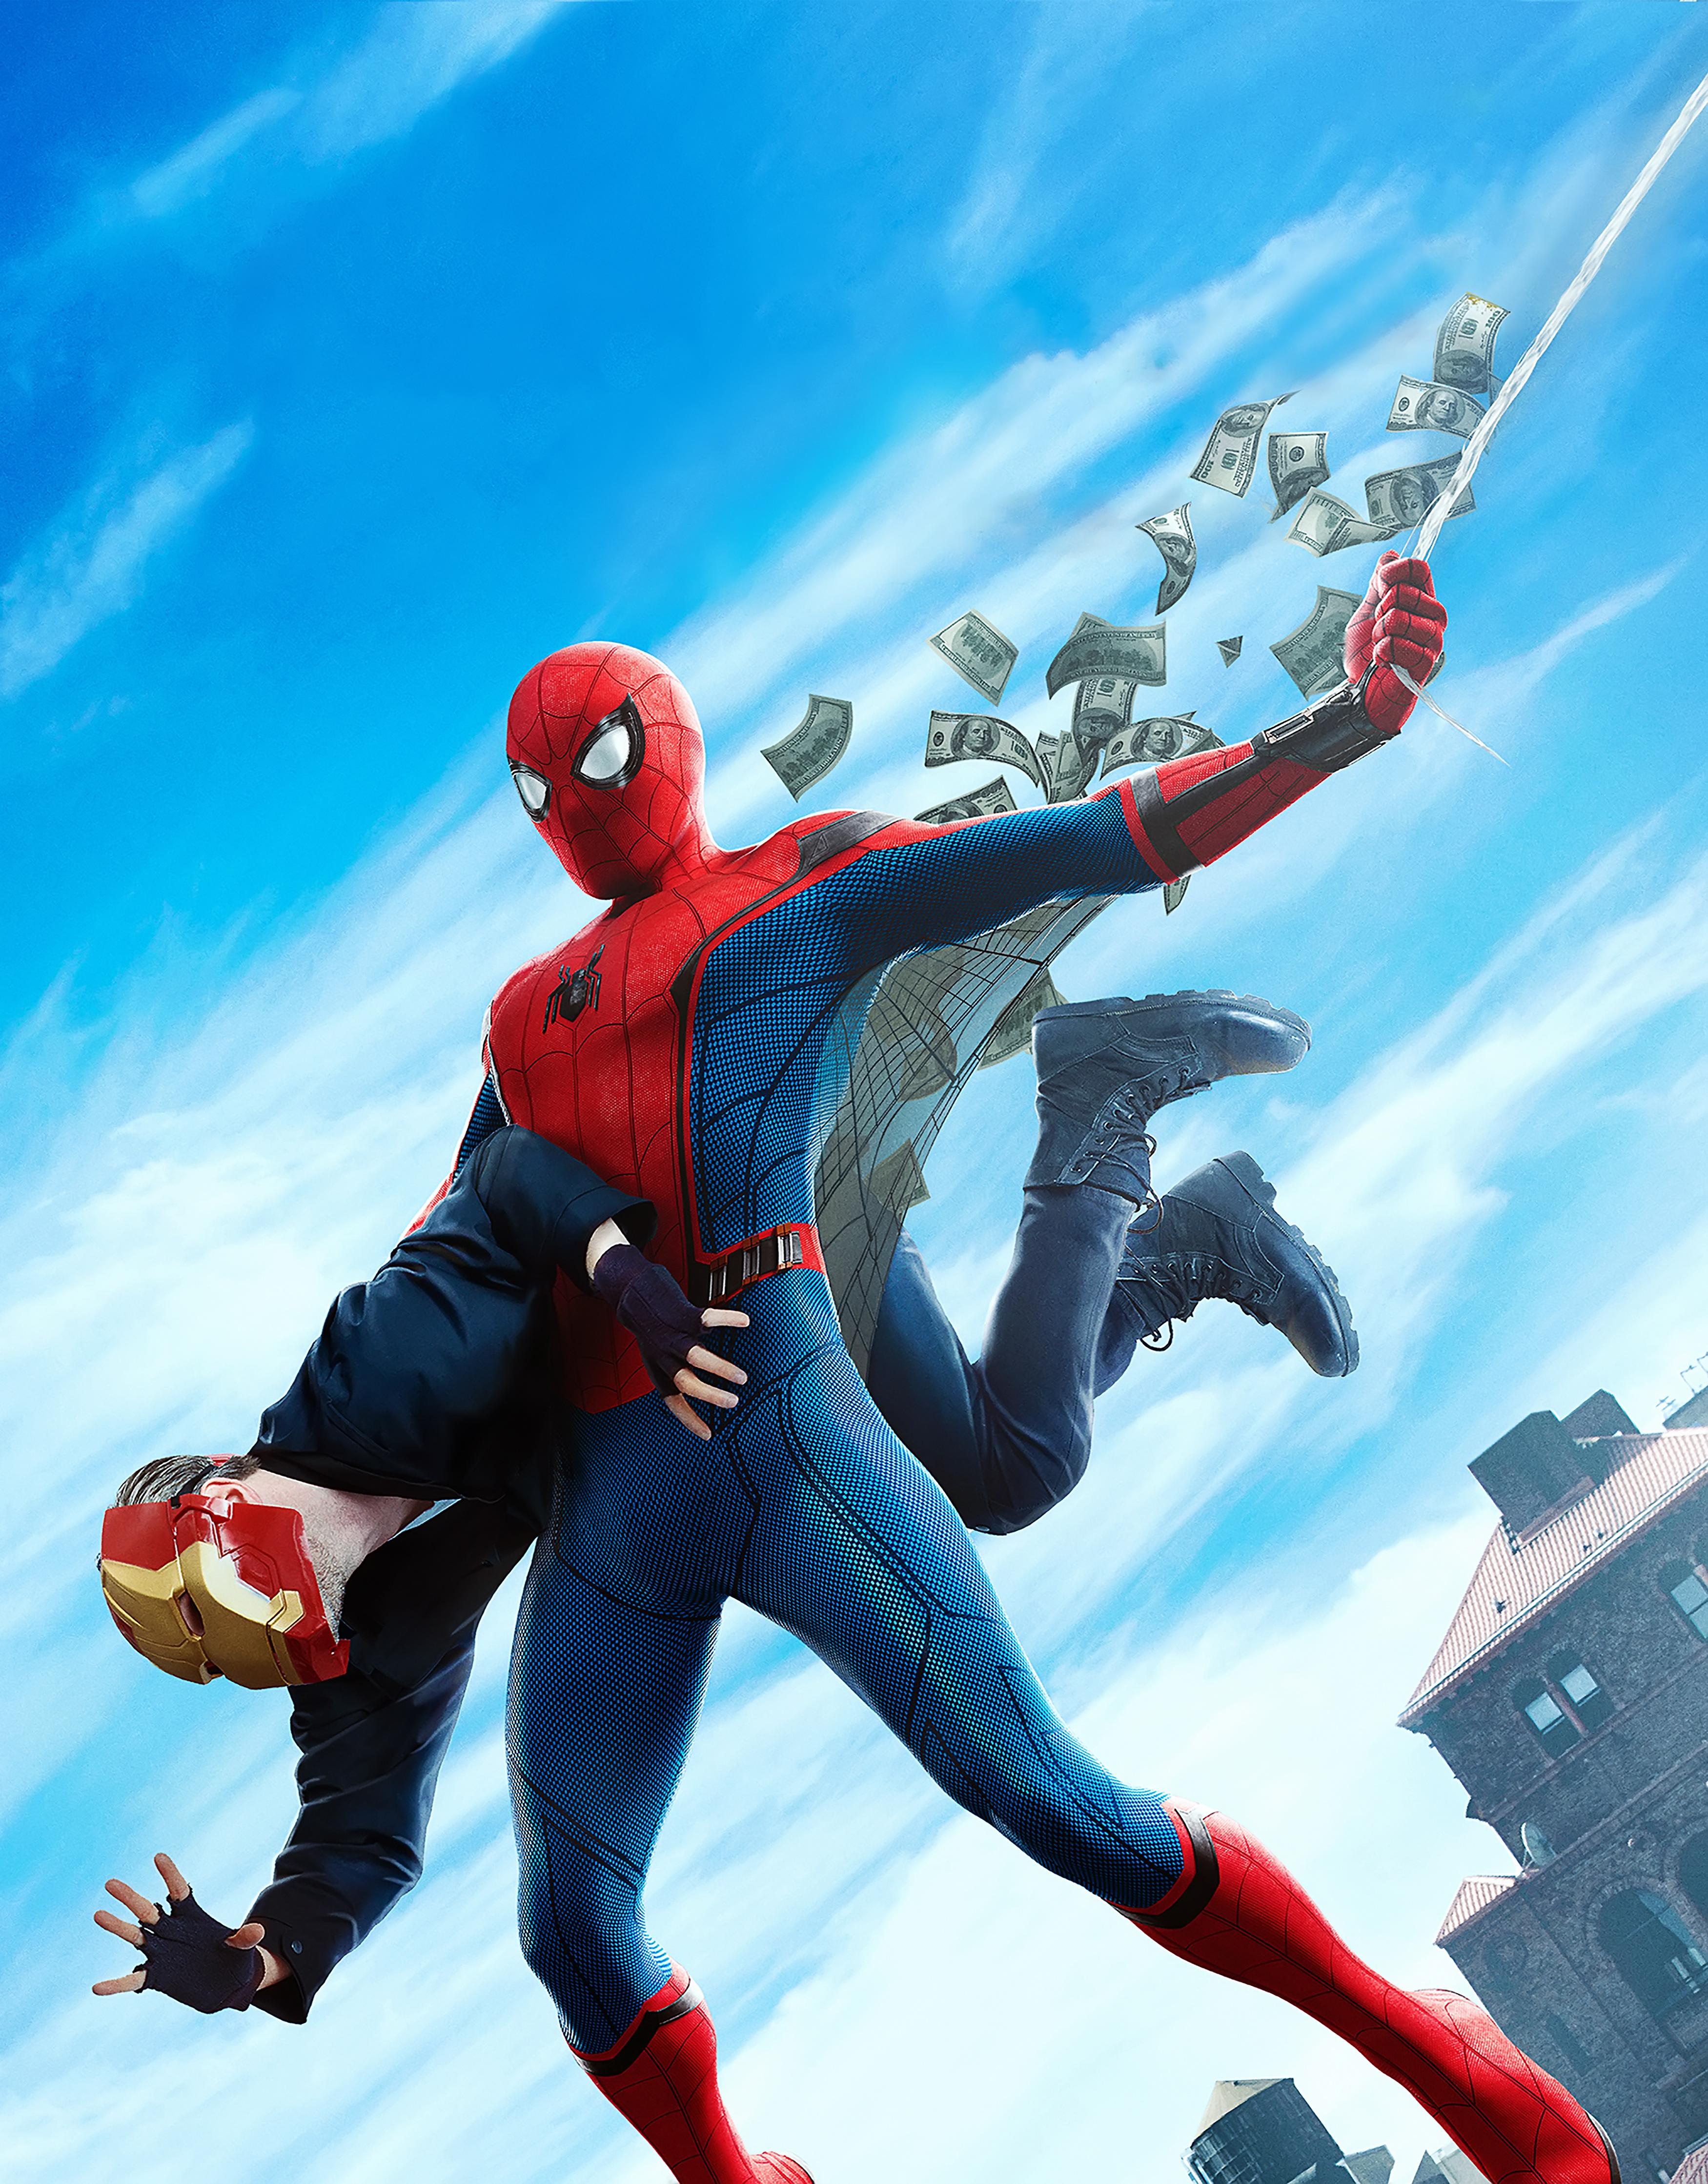 Wallpapers Spider Man Homecoming Heroes comics Spiderman 3500x4475 3500x4475